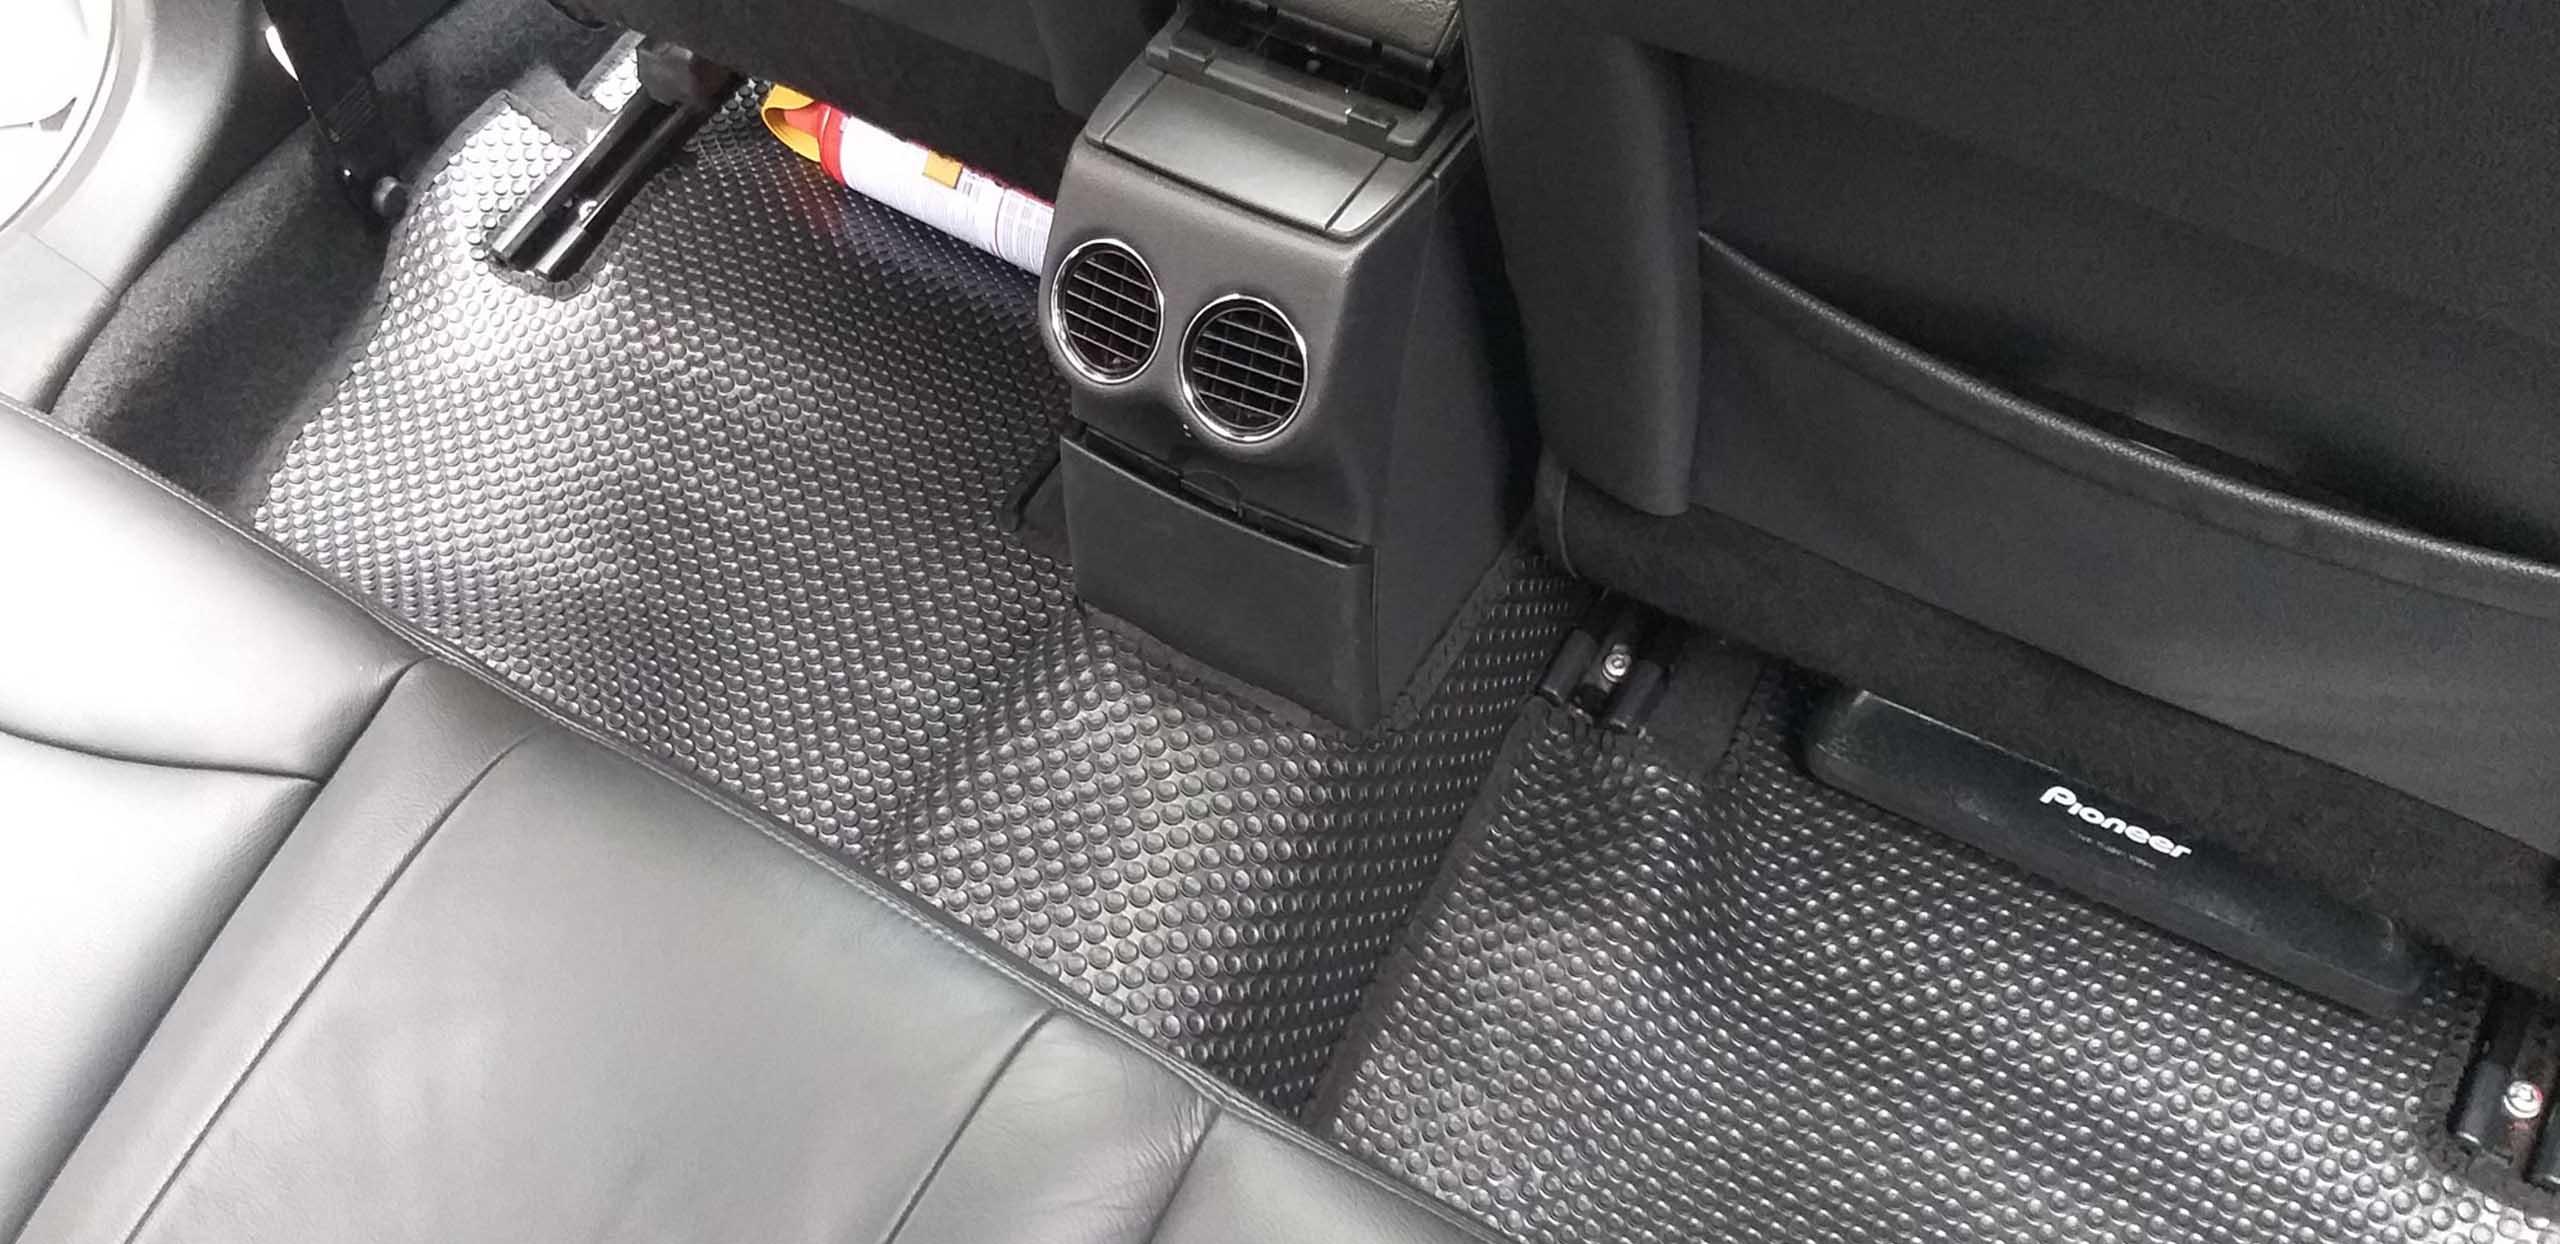 Thảm lót sàn BackLiners Peugeot 408